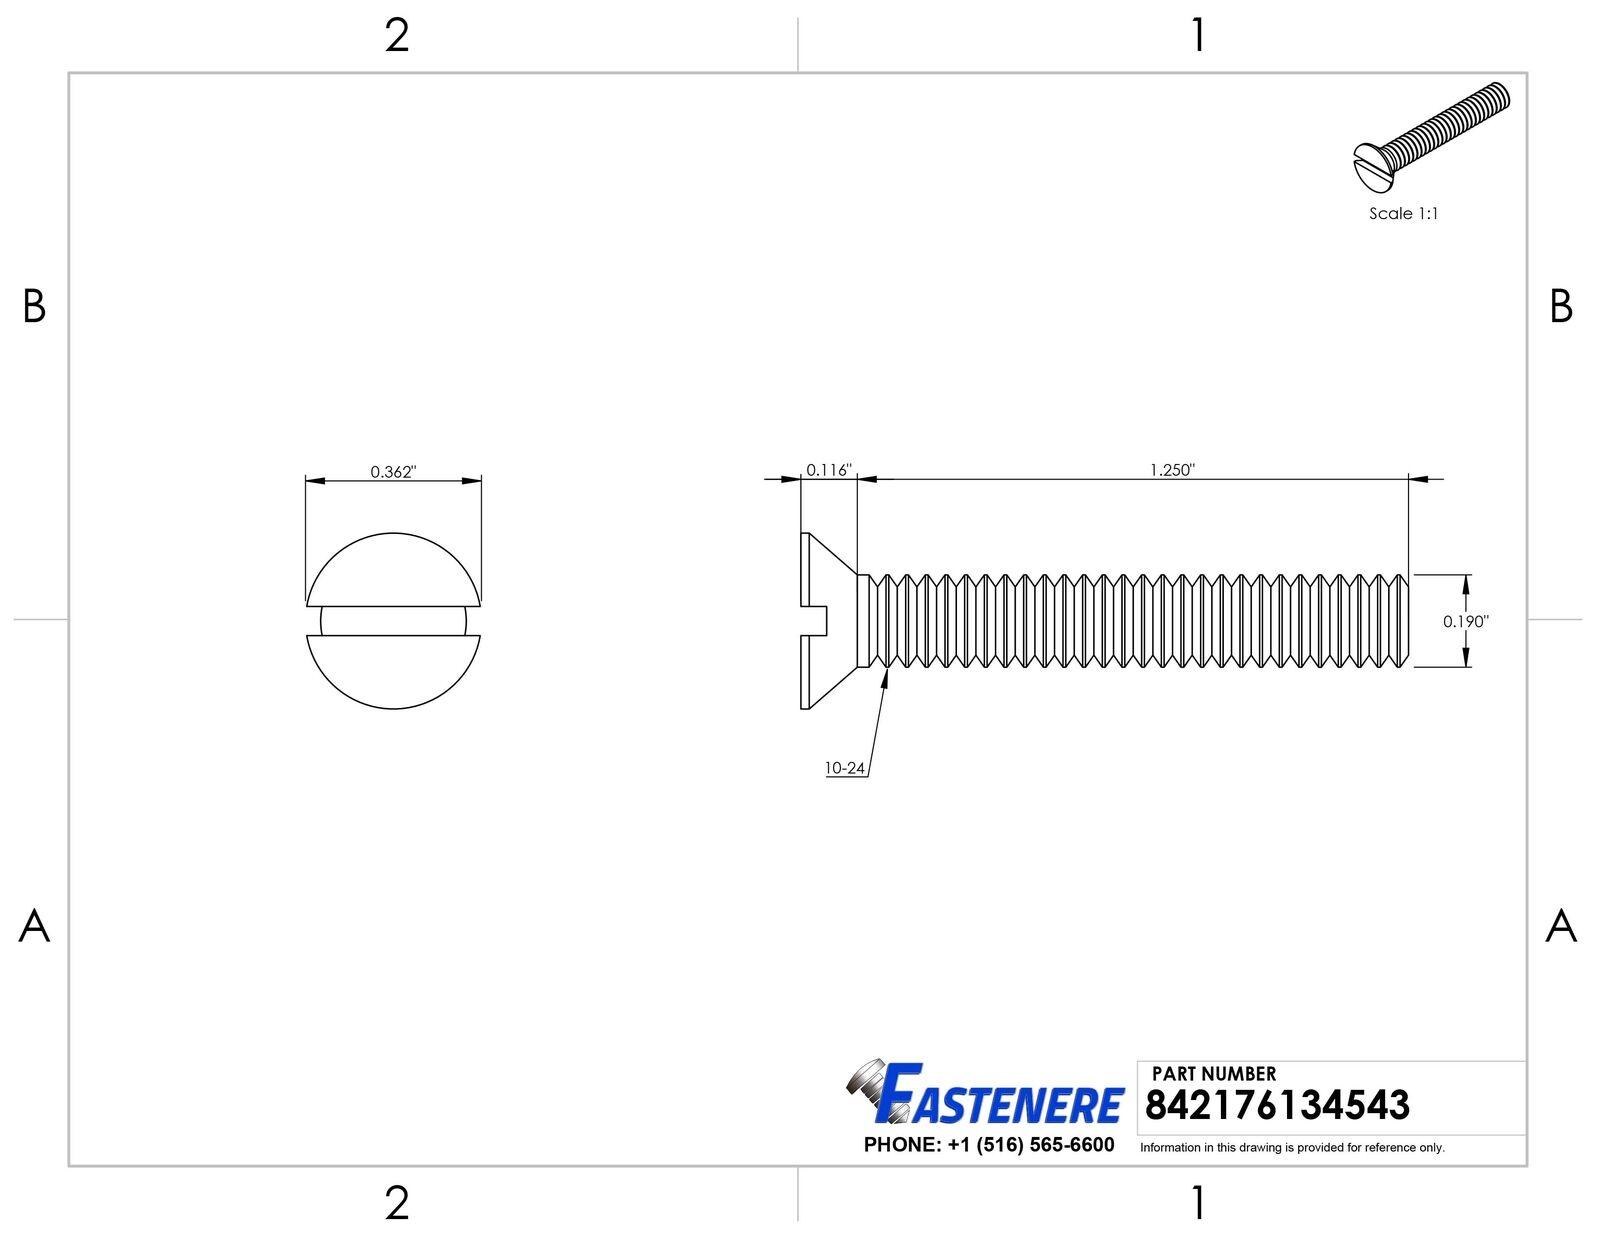 X 1-1/4 1-1/4 1-1/4 Cabeza Plana Ranurado Tornillos de Máquina Acero Inoxidable 18-8 Qty 500 55e08f